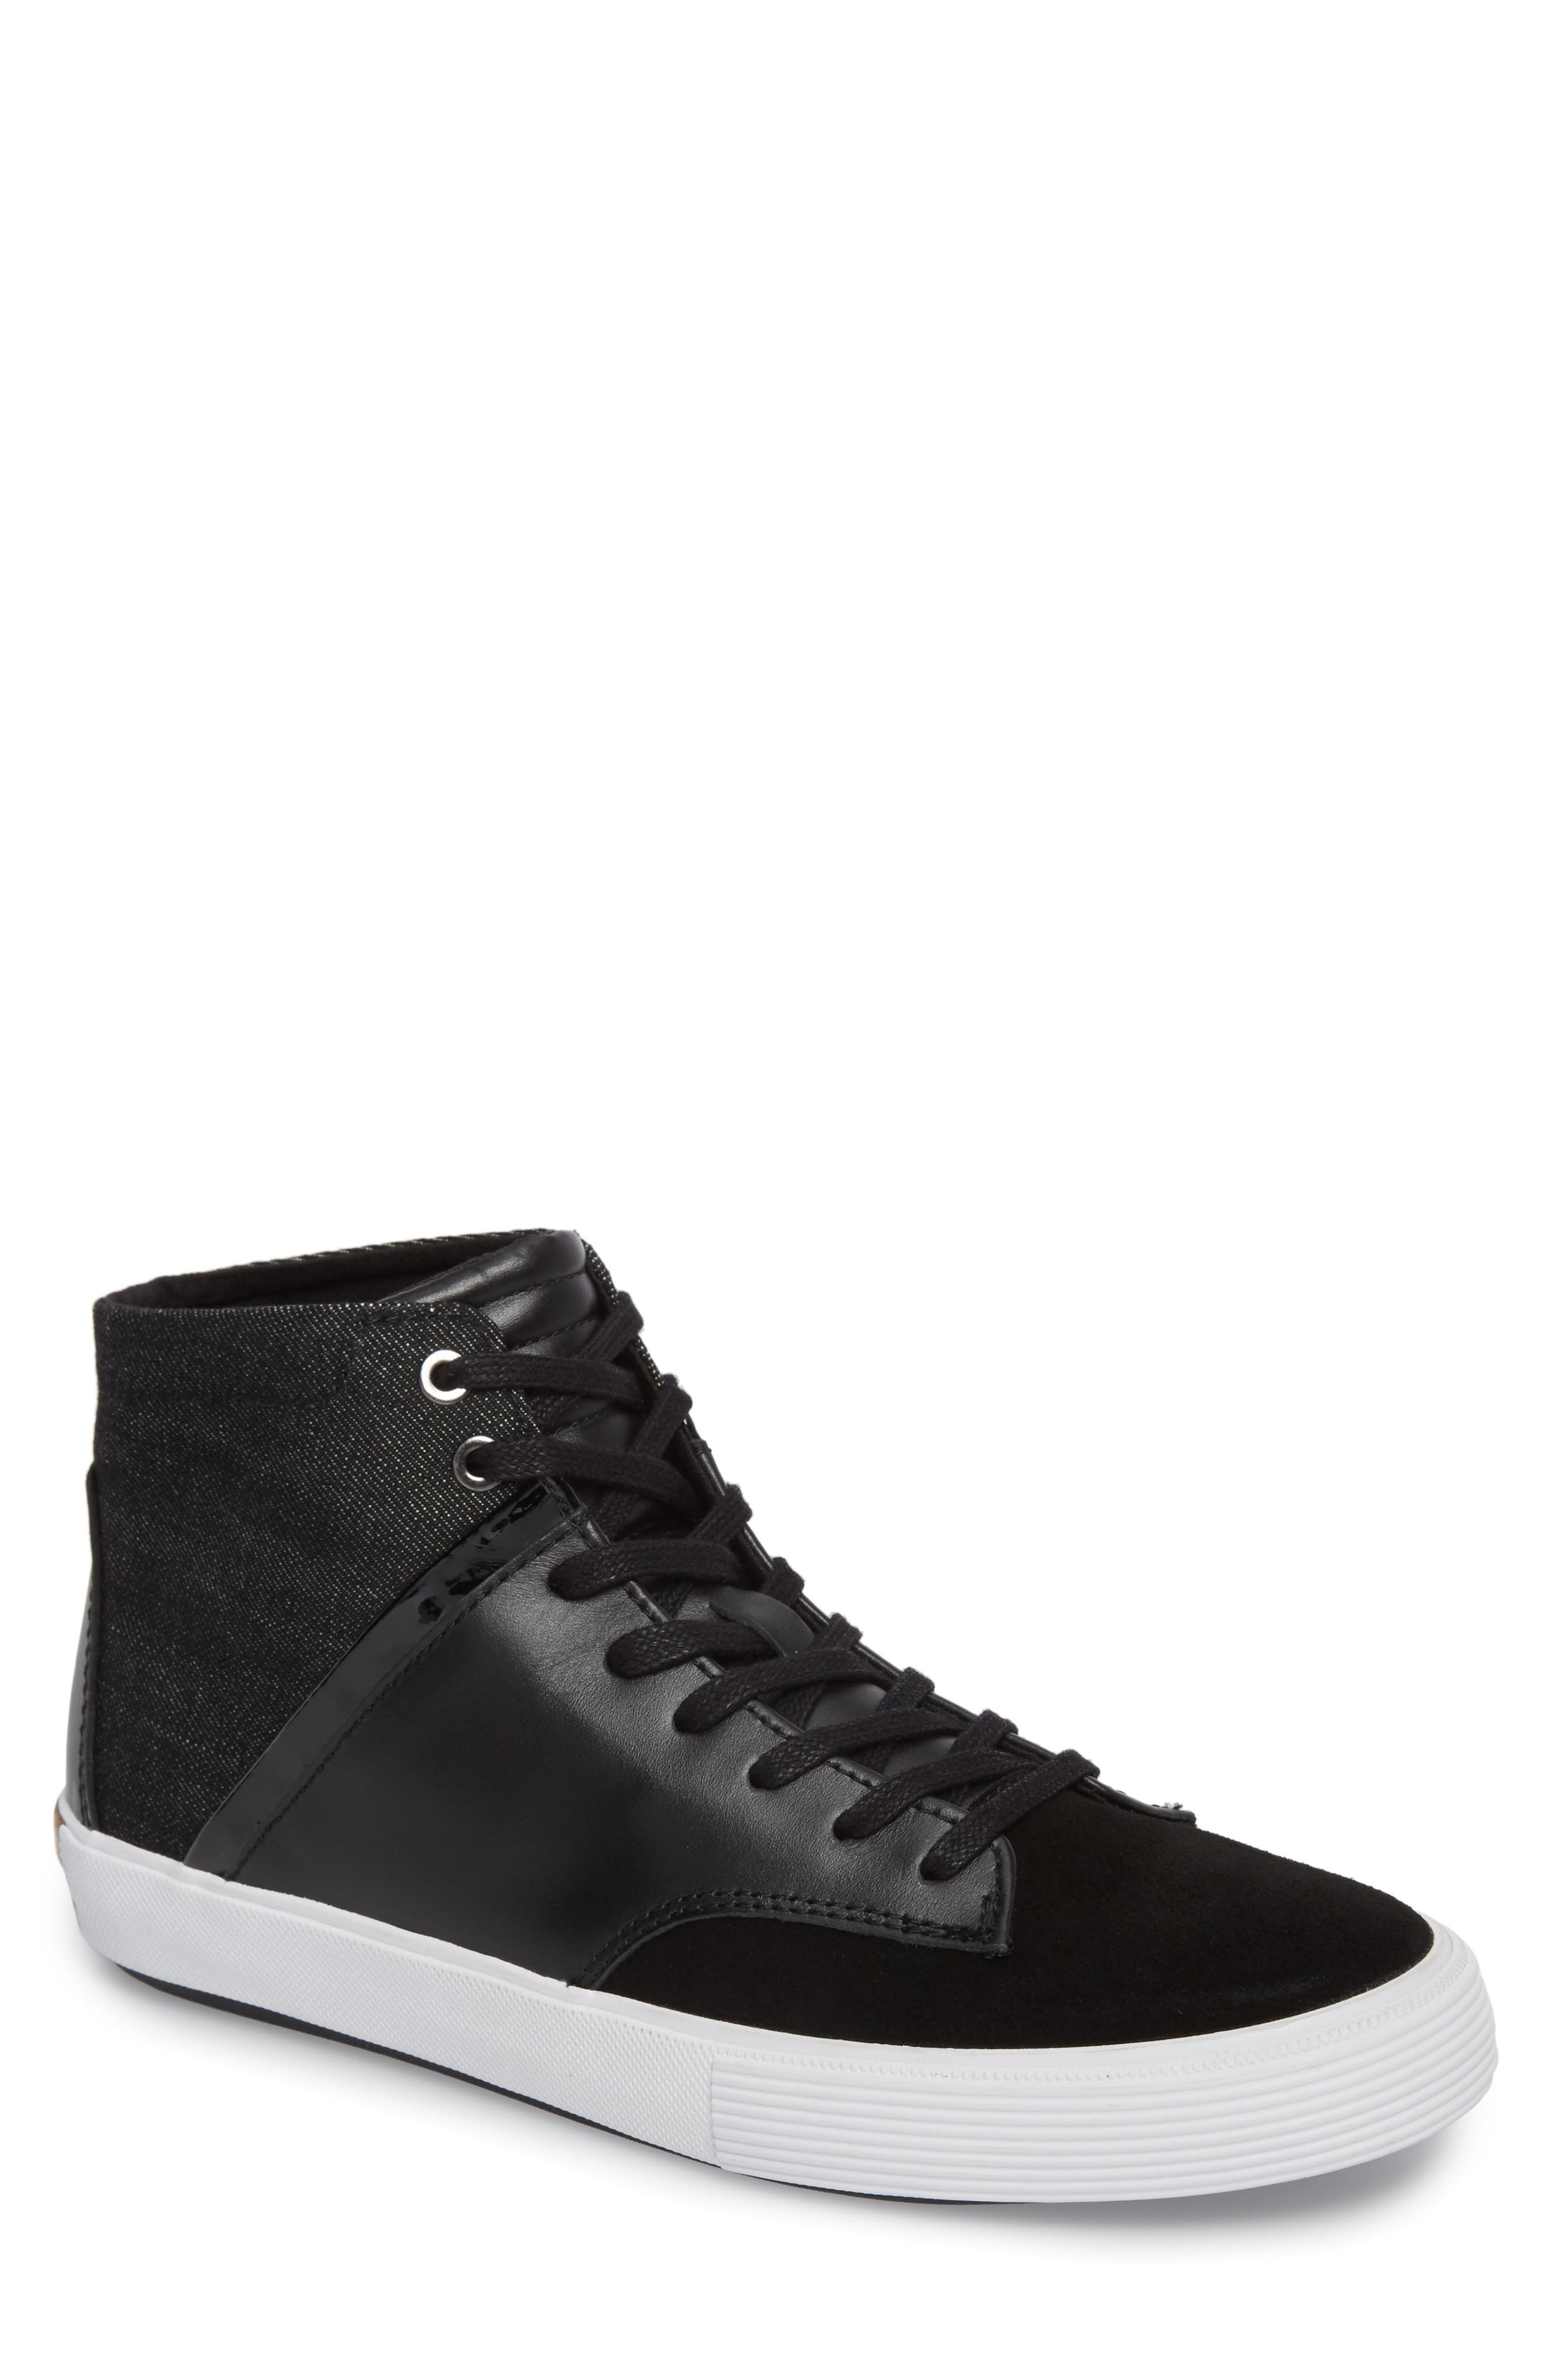 Joe Mac High Top Sneaker,                             Main thumbnail 1, color,                             Black Leather